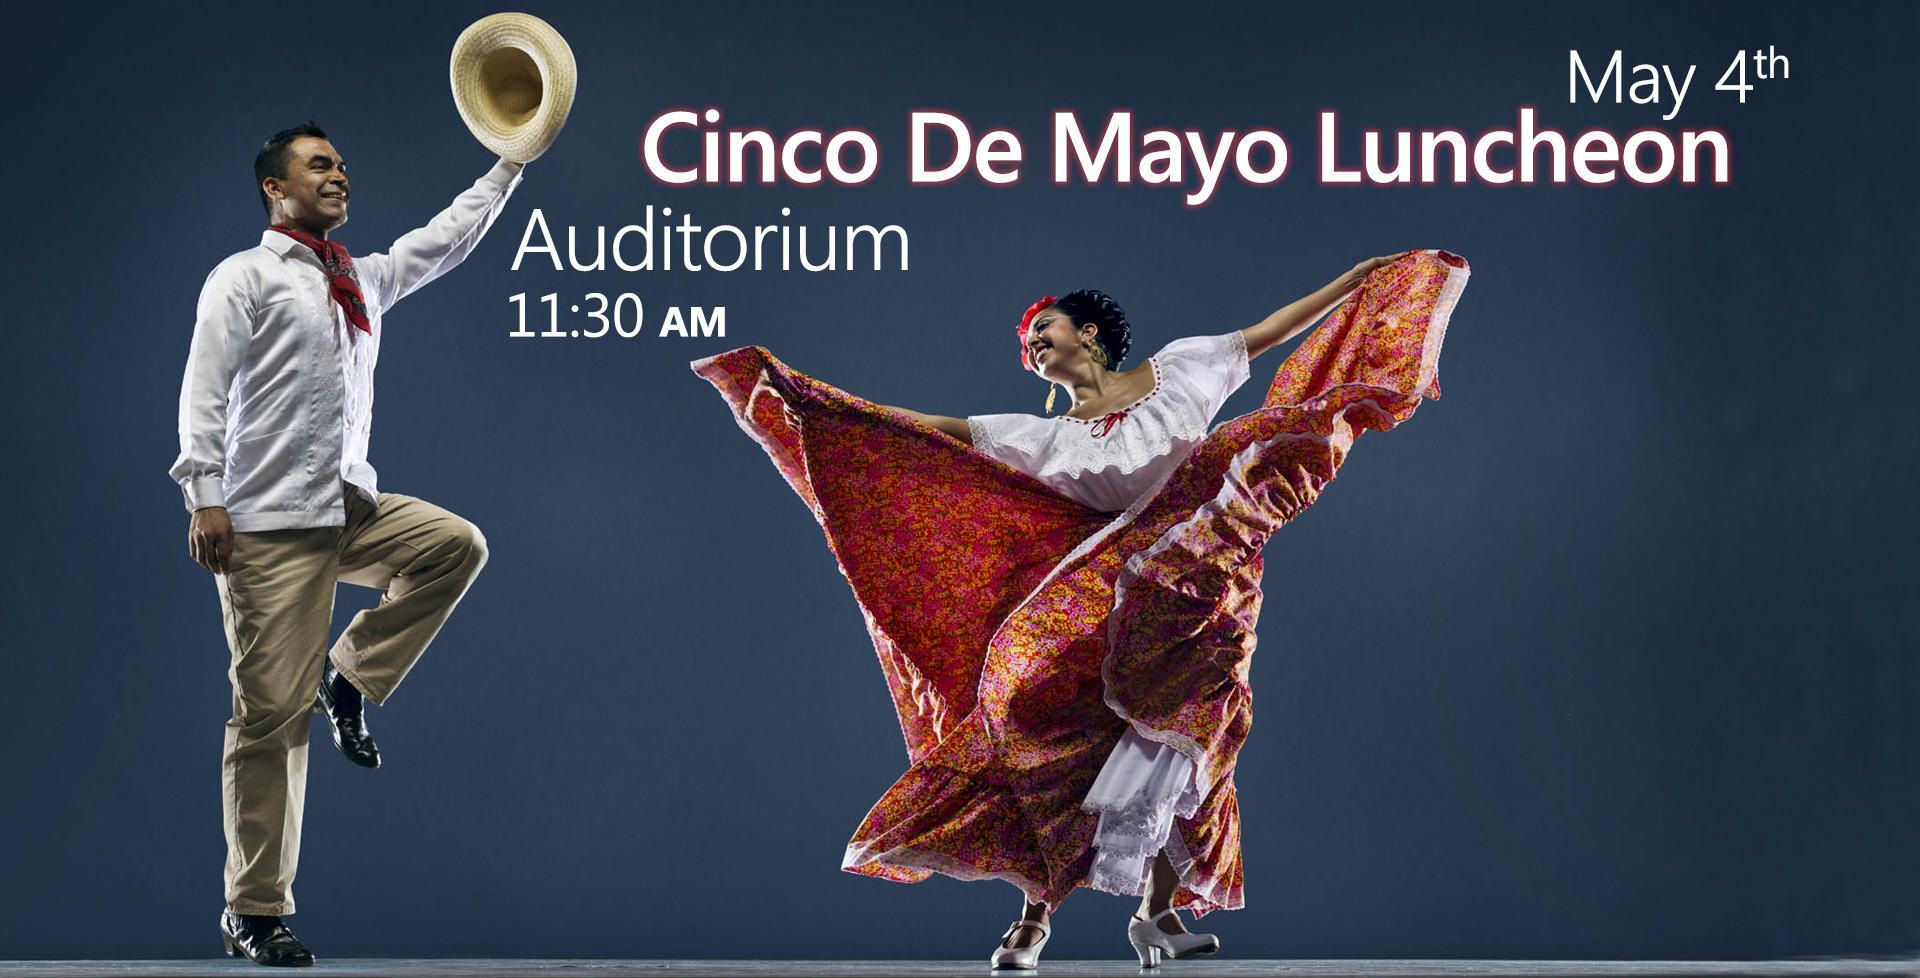 May 4 > Cinco De Mayo Luncheon